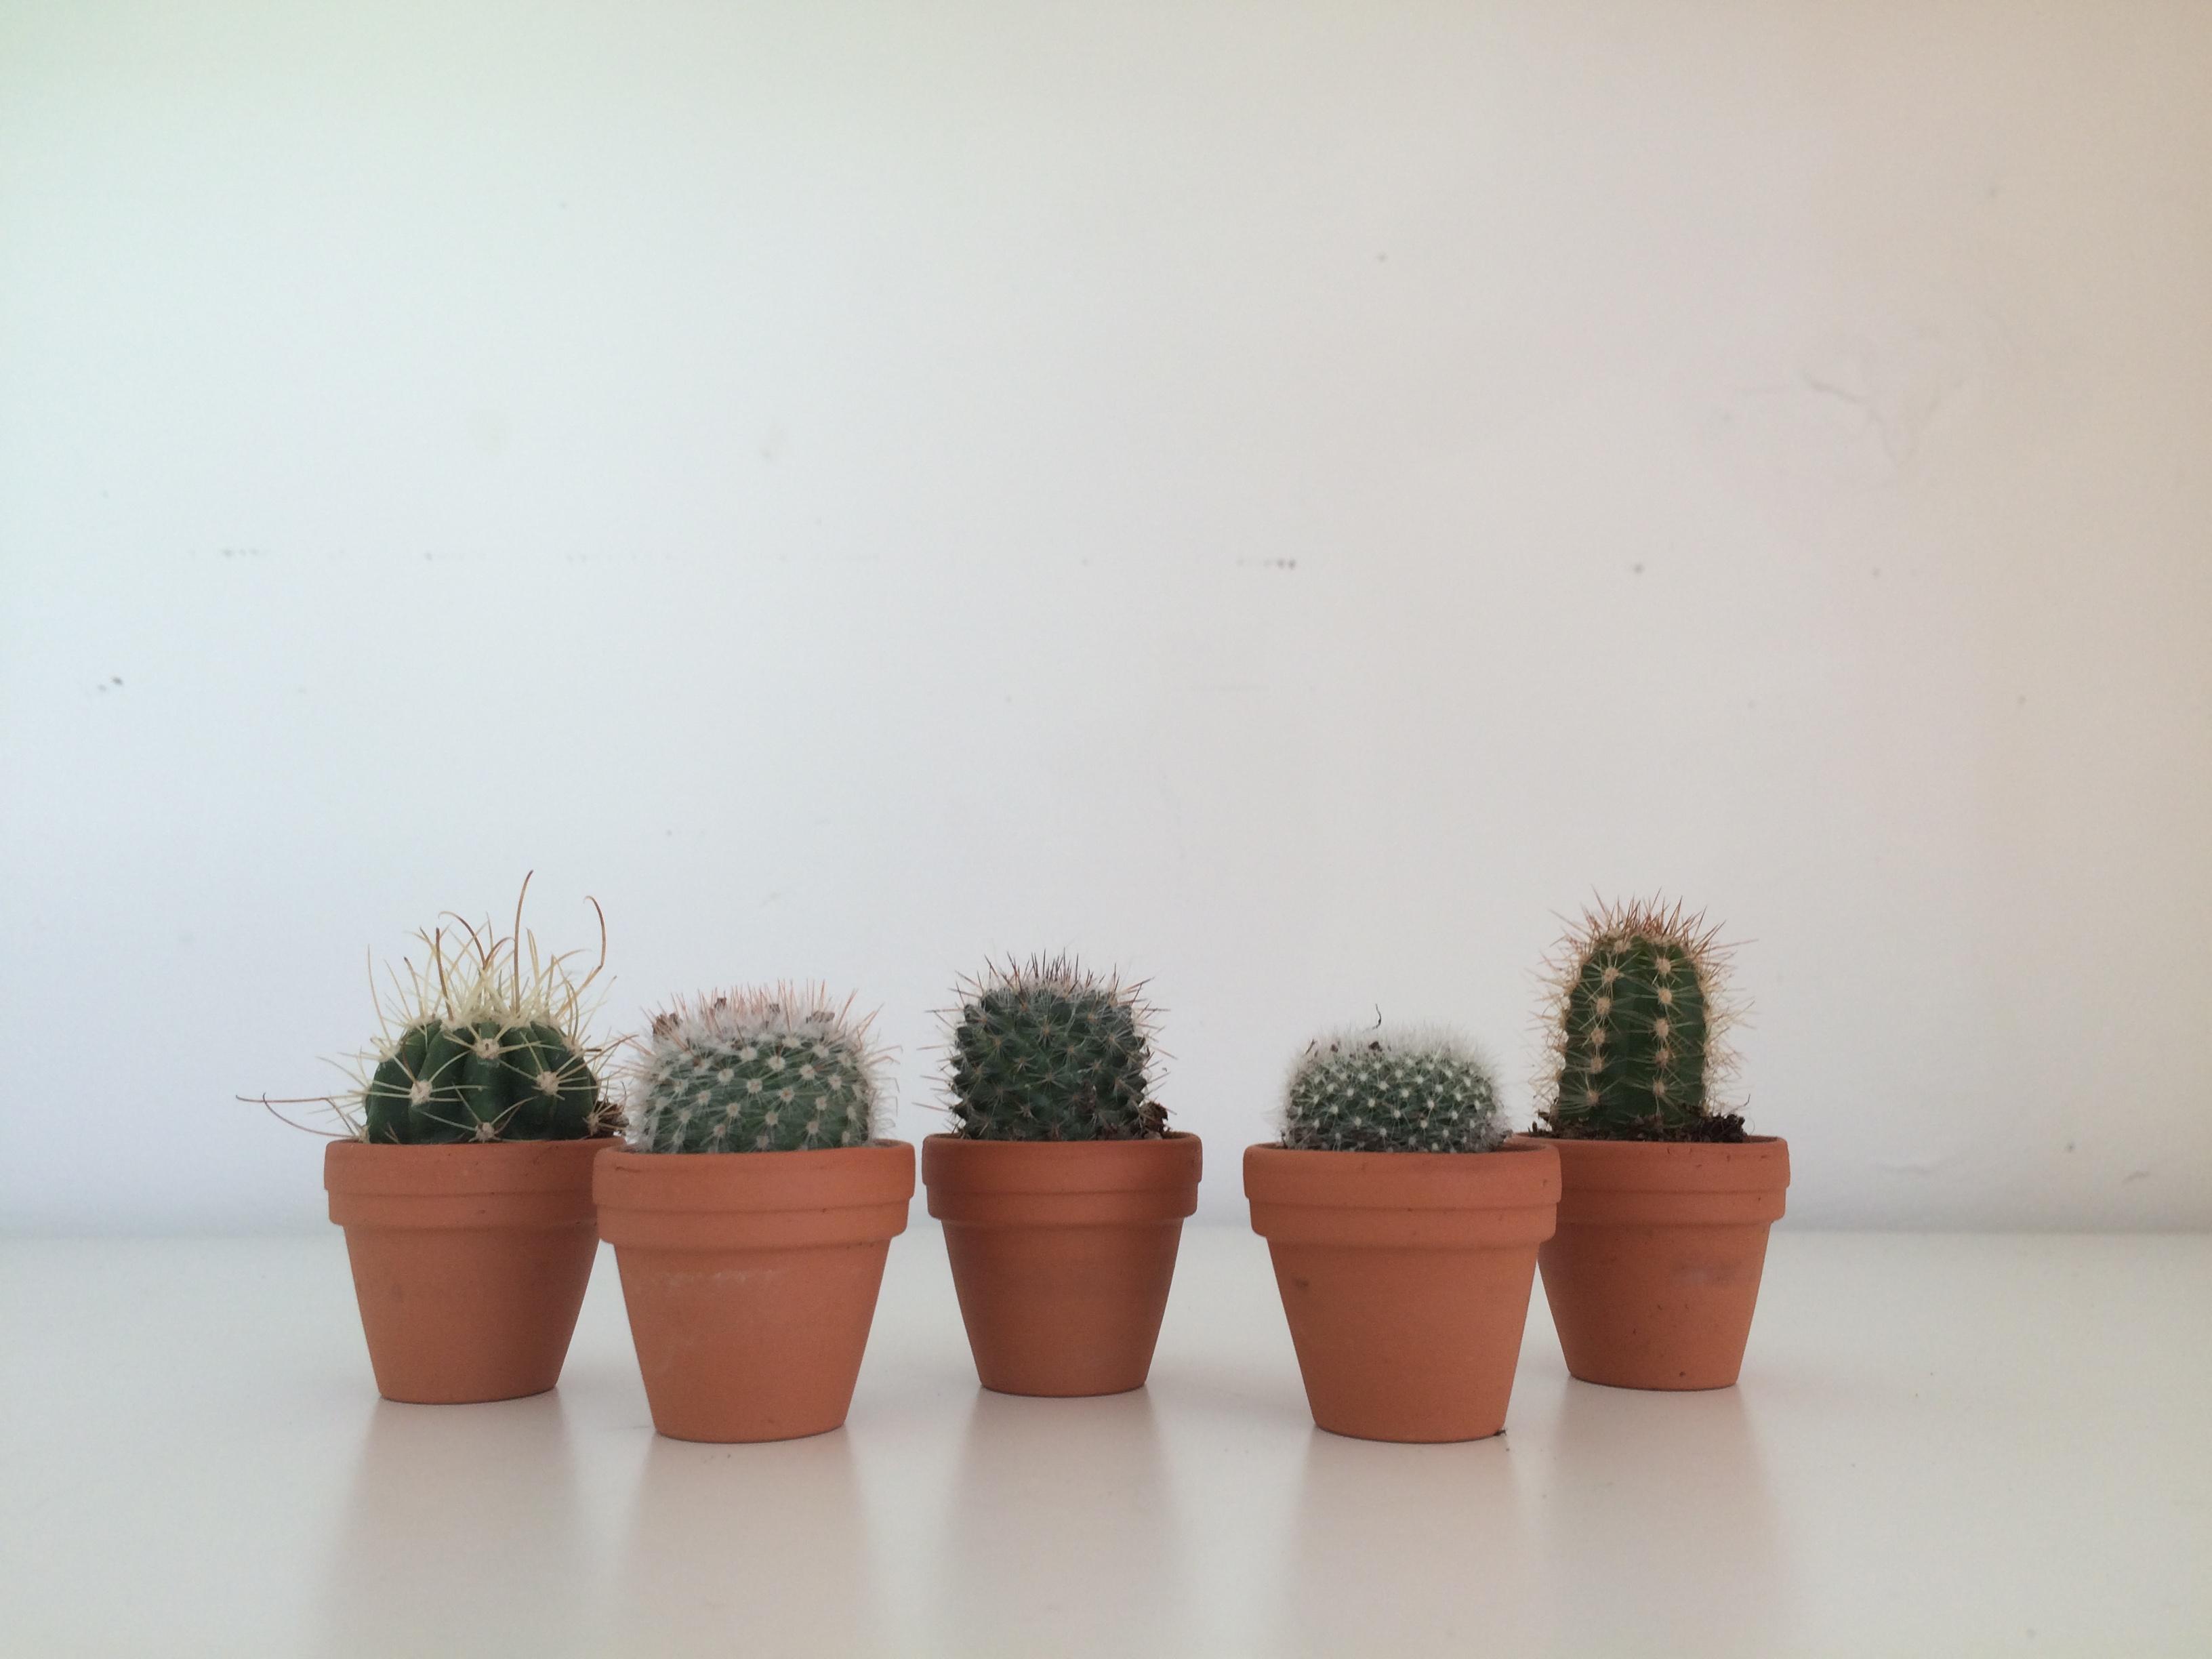 5 Mini Cacti Mix | The Glass Gardener